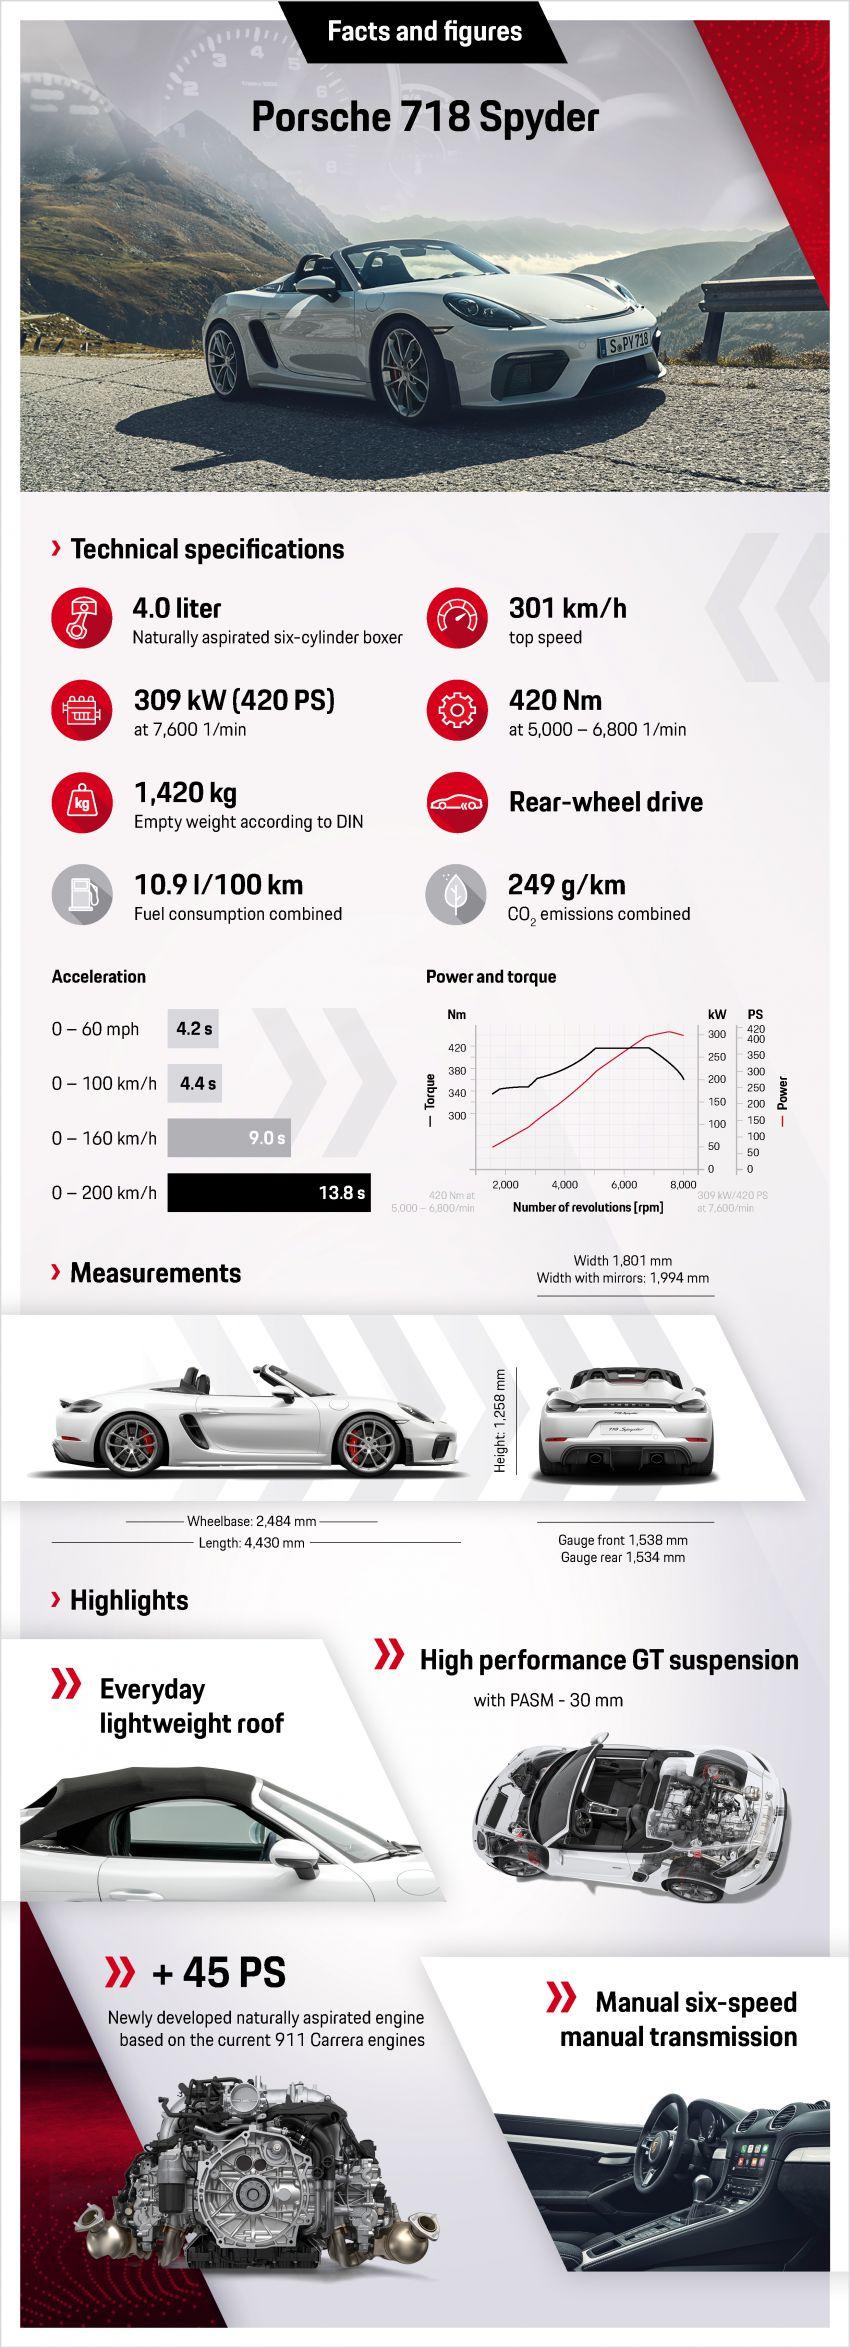 Porsche 718 Cayman GT4, Boxster Spyder unveiled Image #973348